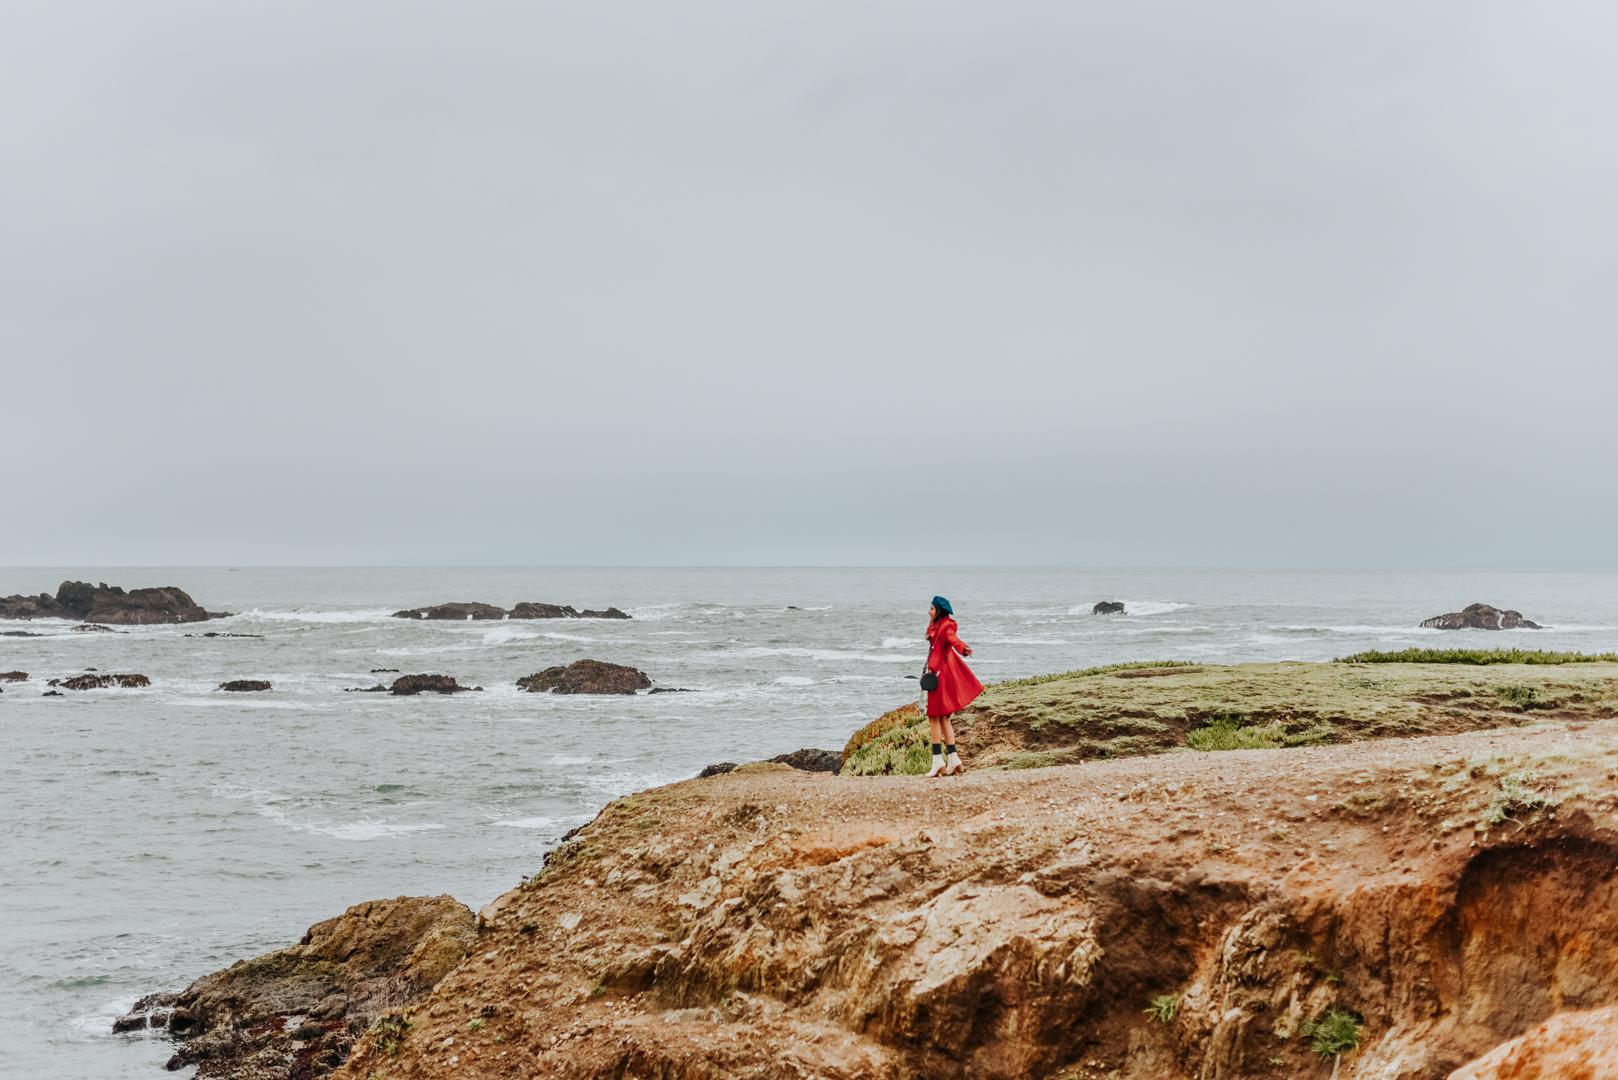 mendocino-headlands-travel-california-blogger 10